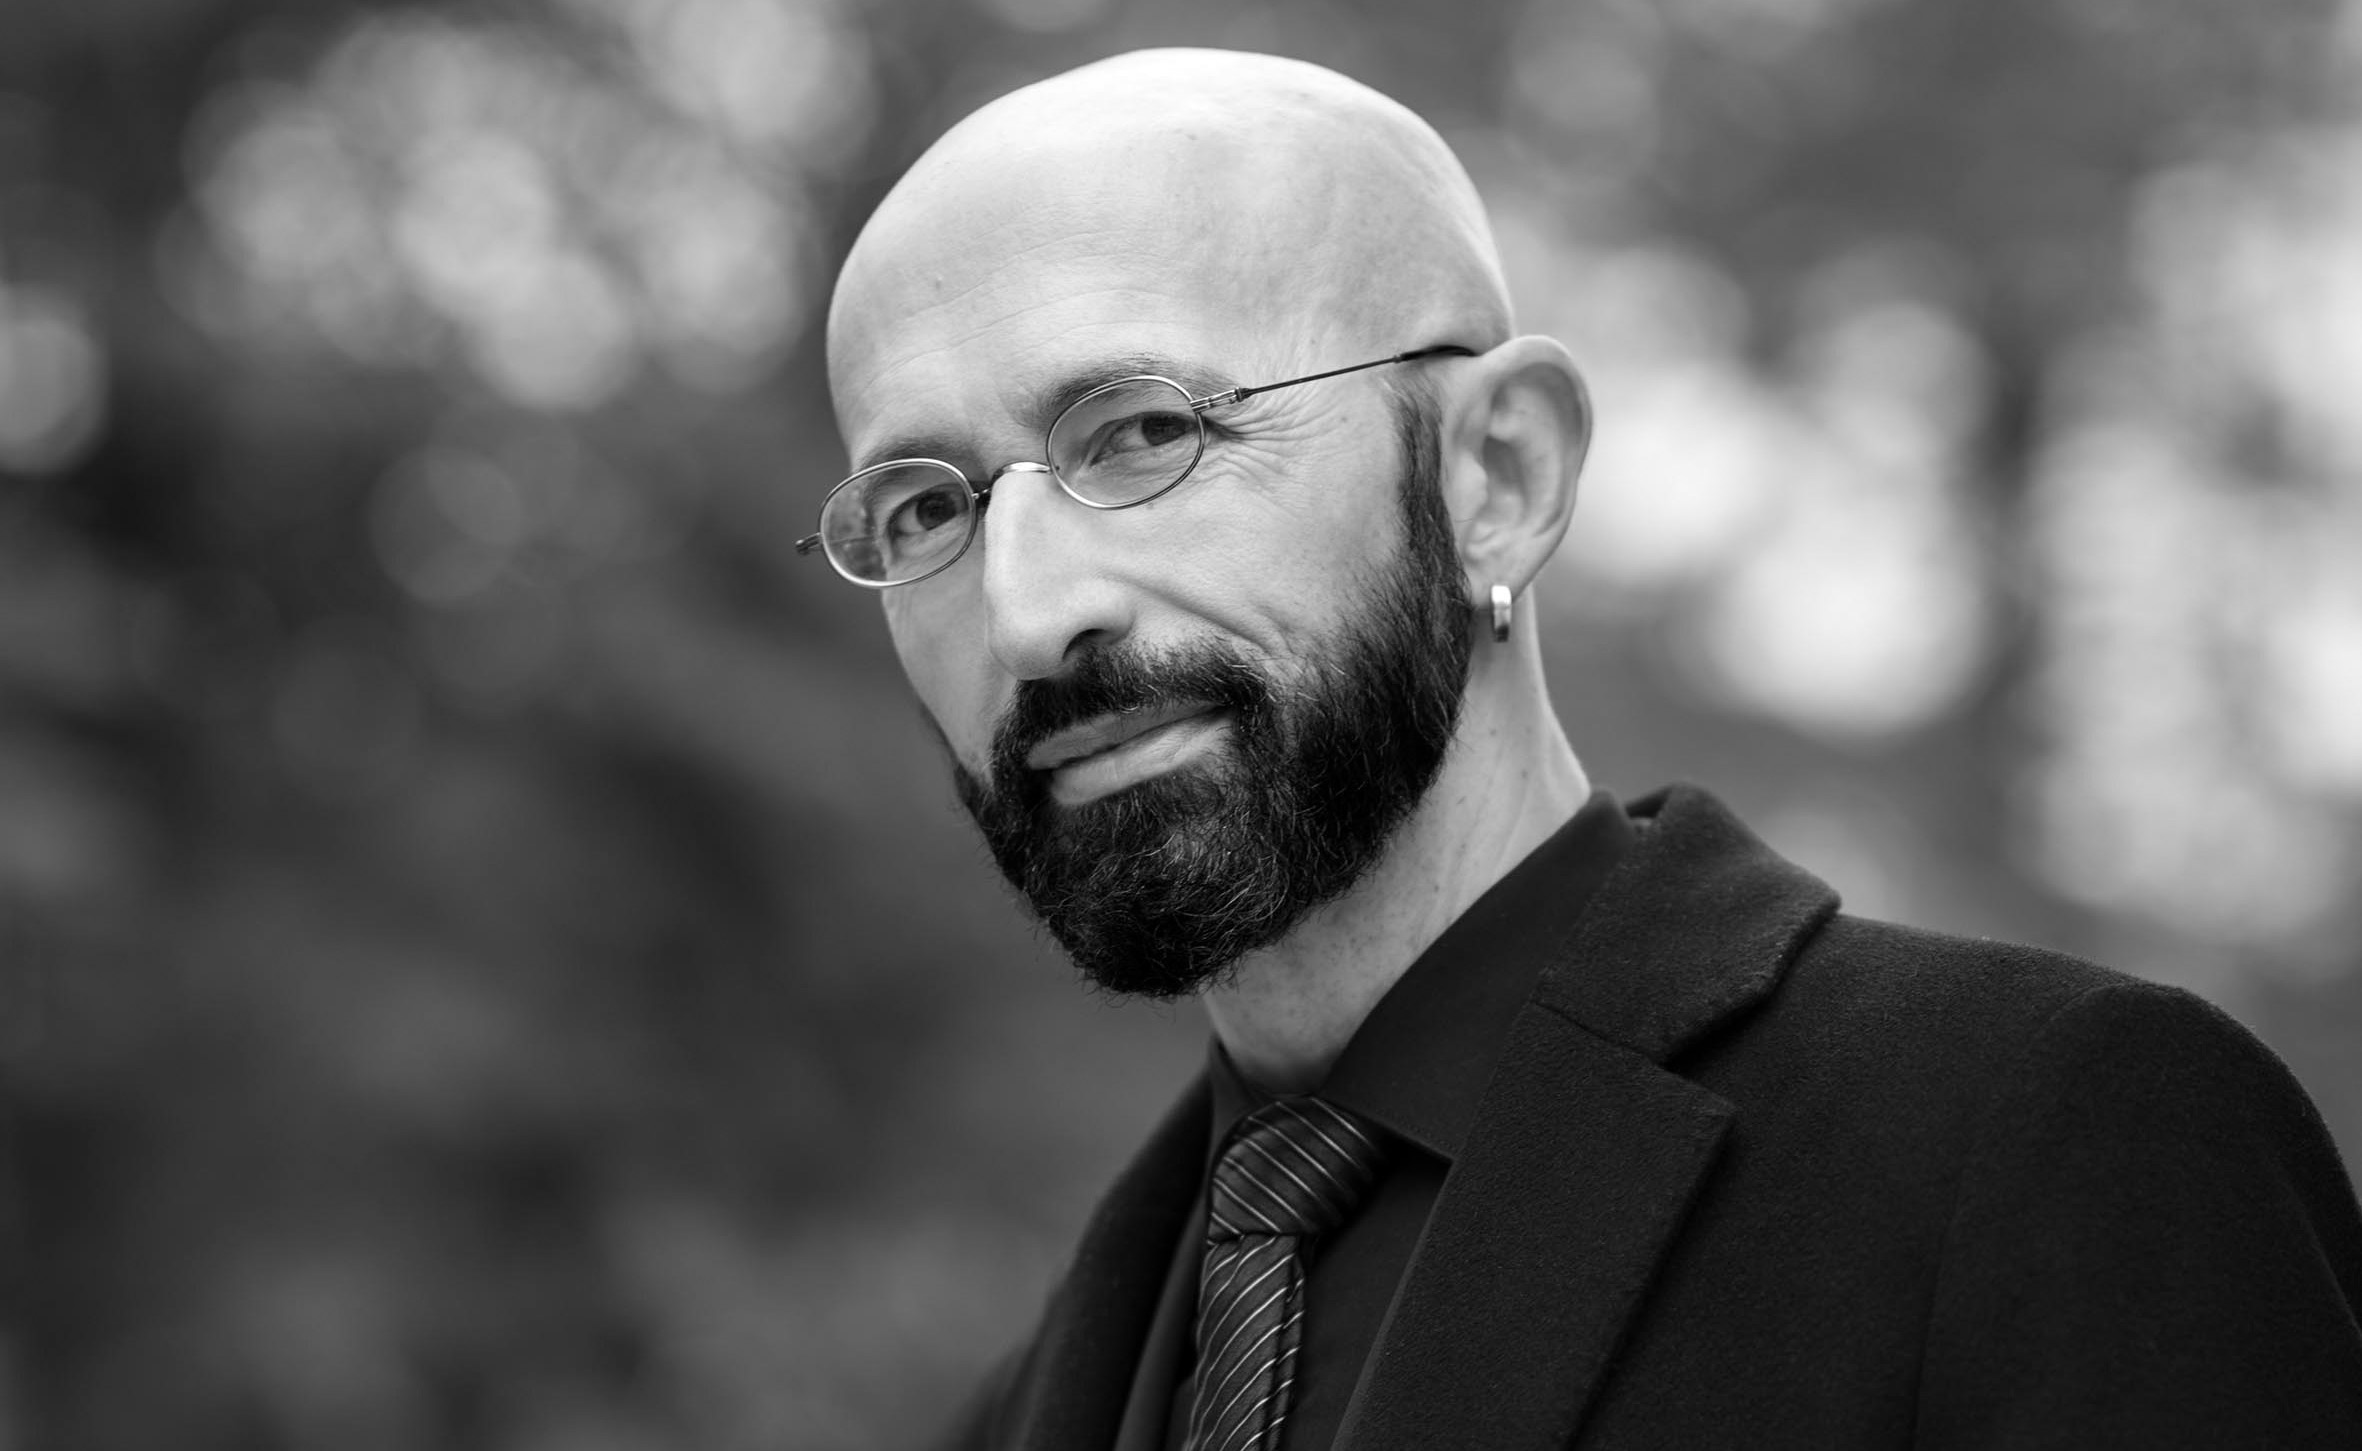 Antonio Casilli - Faculty Fellow